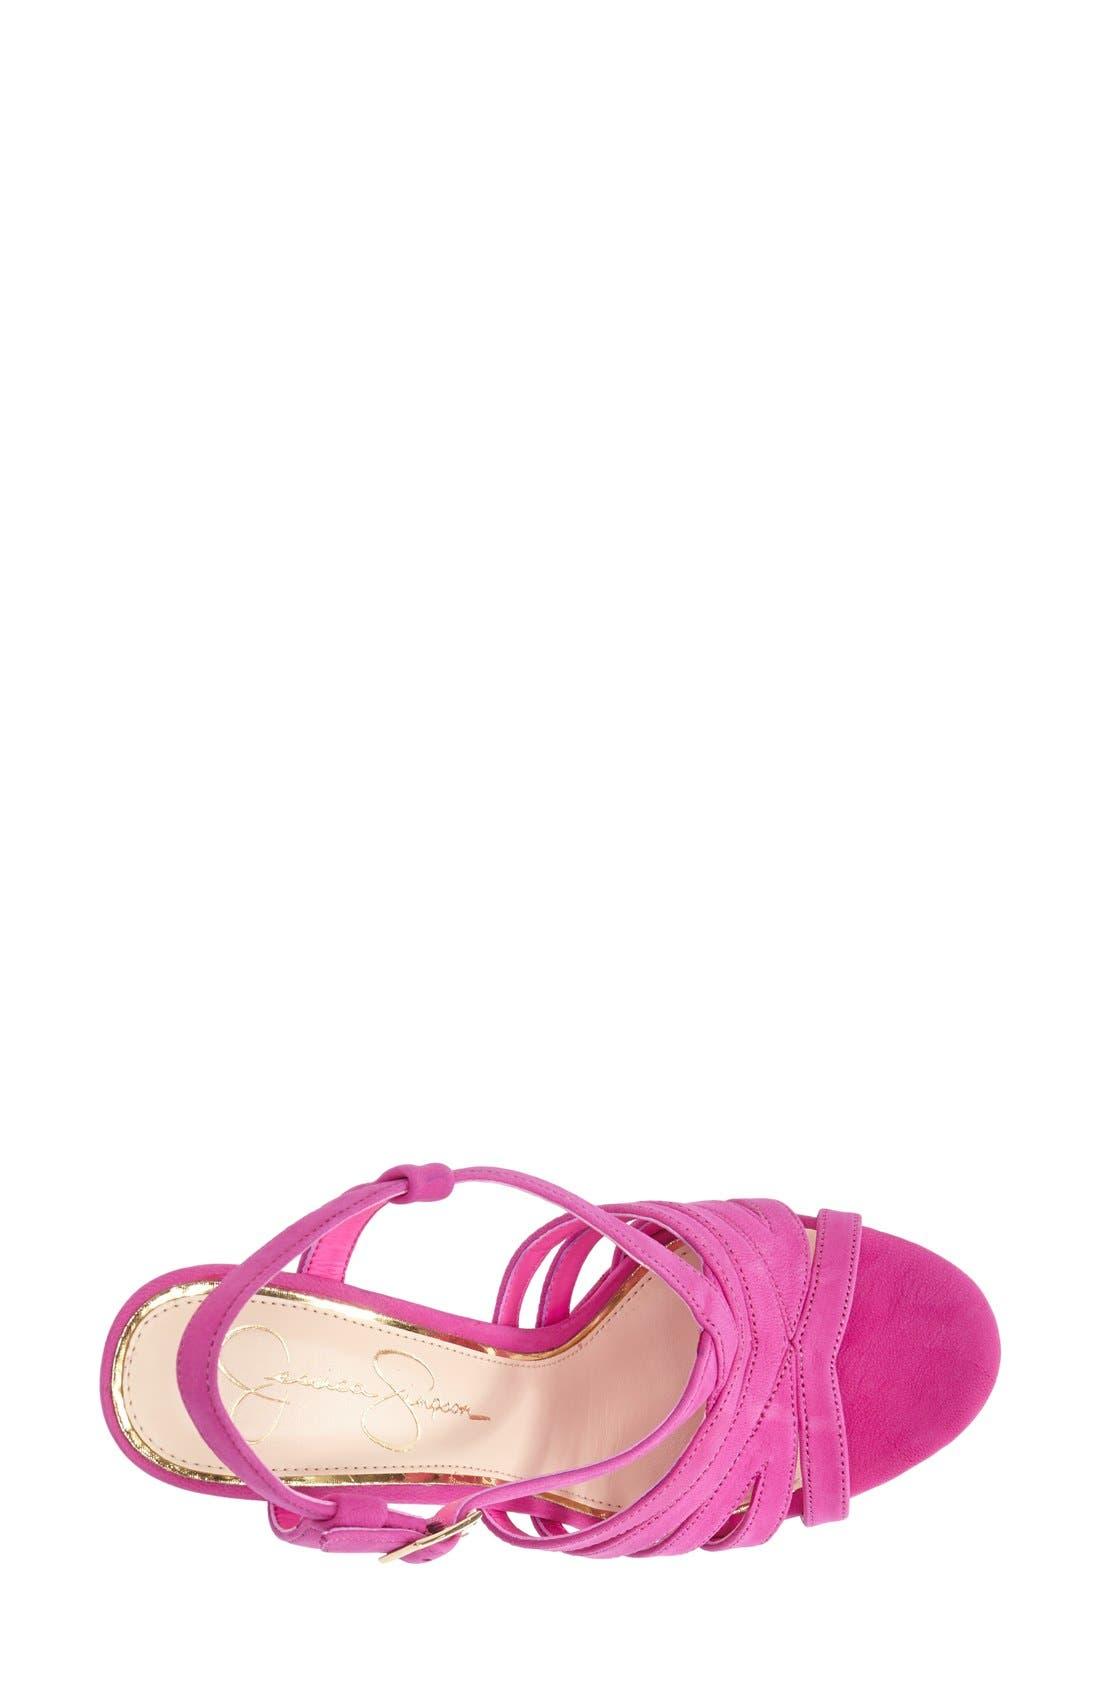 Alternate Image 3  - Jessica Simpson 'Peace' Suede Peep Toe Platform Sandal (Women)